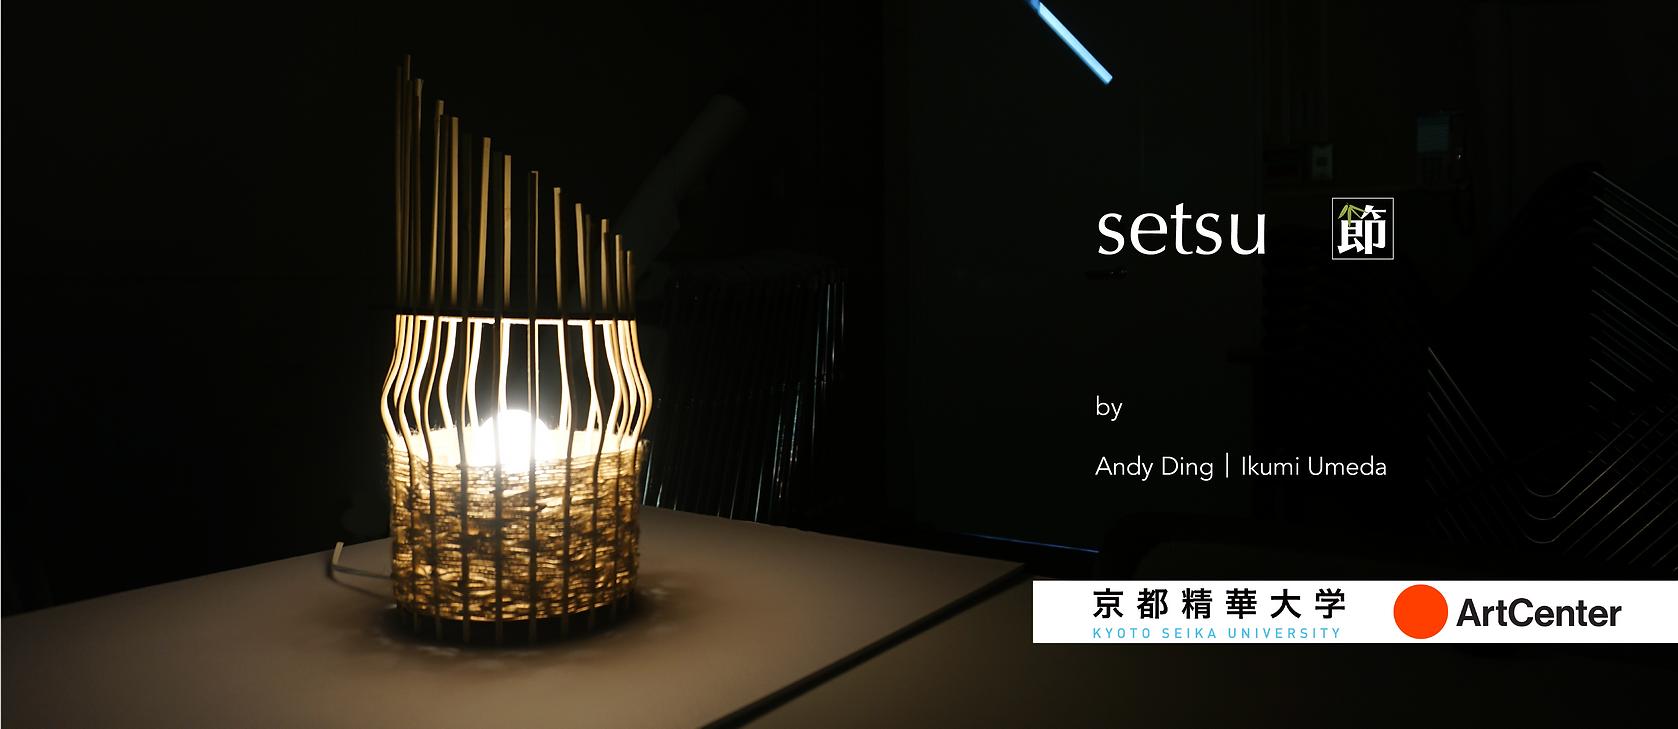 SETSU WEBSITE-09.png